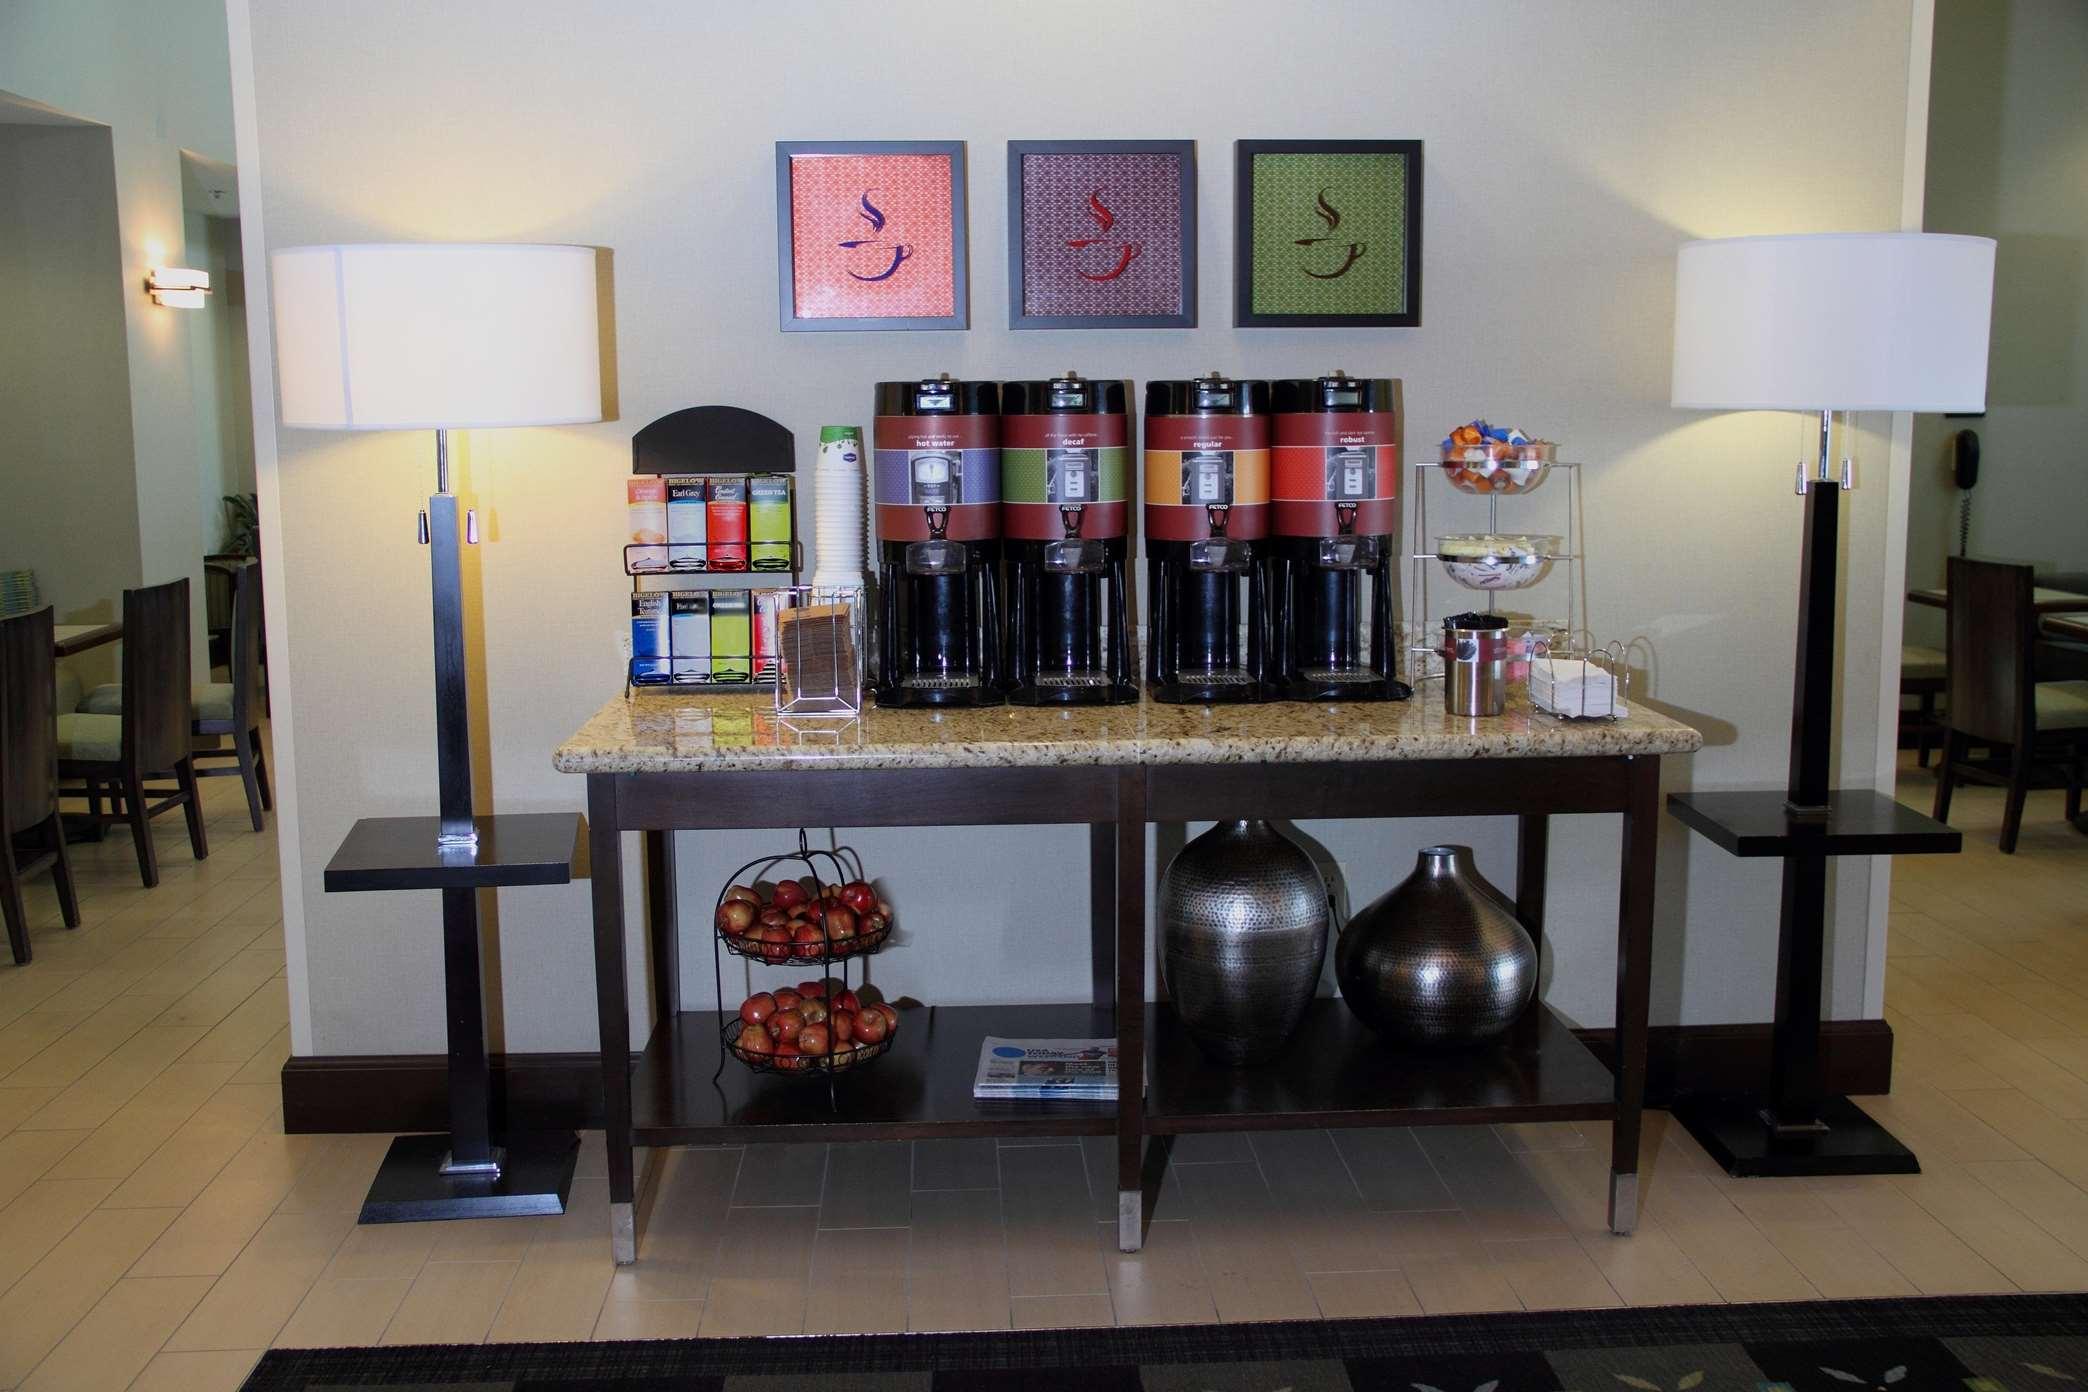 Hampton Inn & Suites Manteca image 8